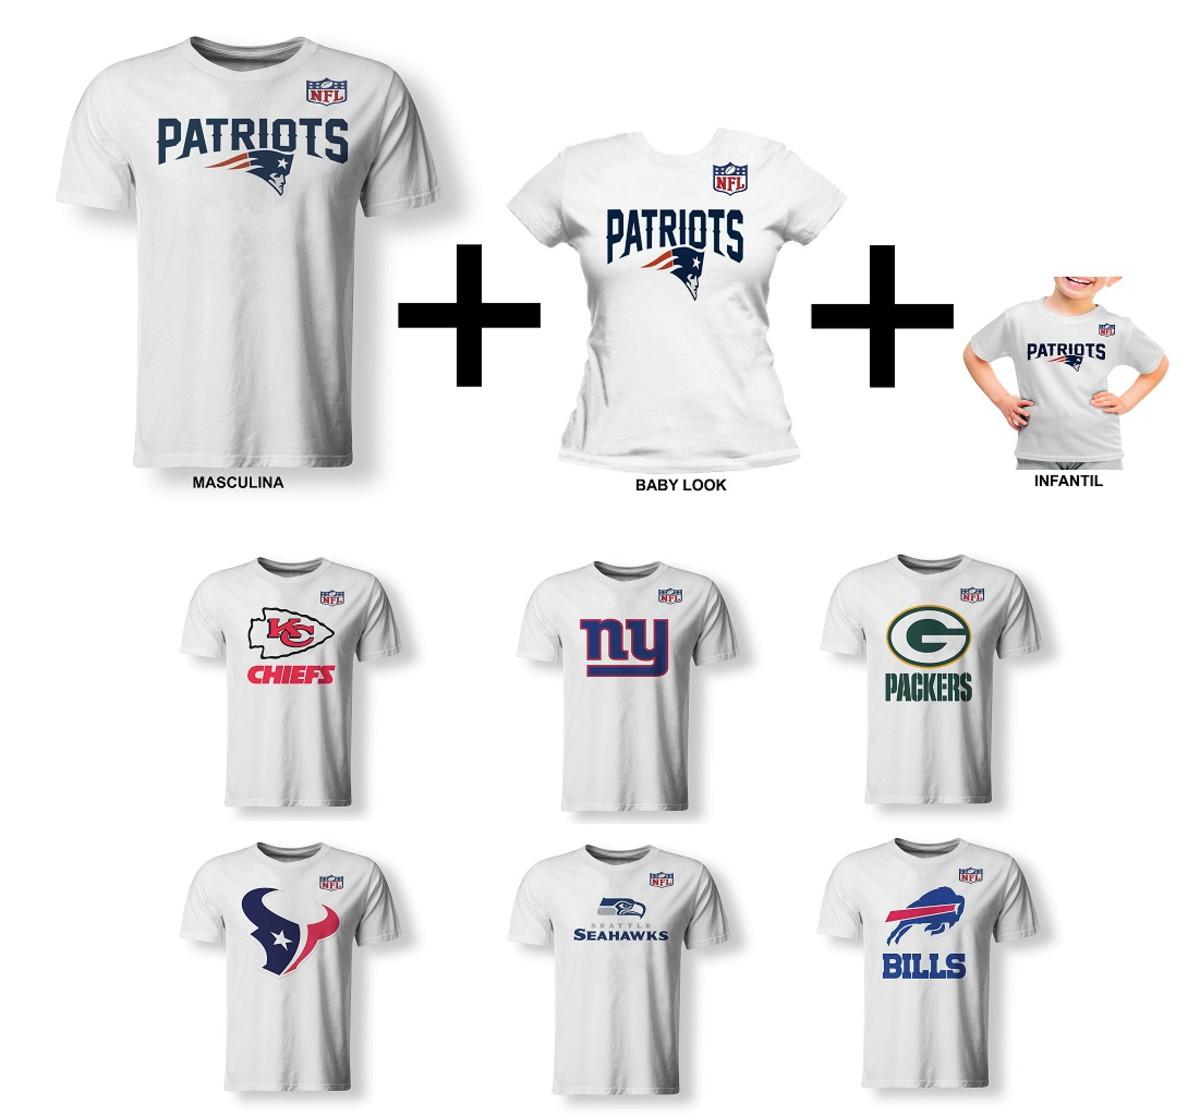 7efd2ea85 Kit 03 Camisetas Família NFL